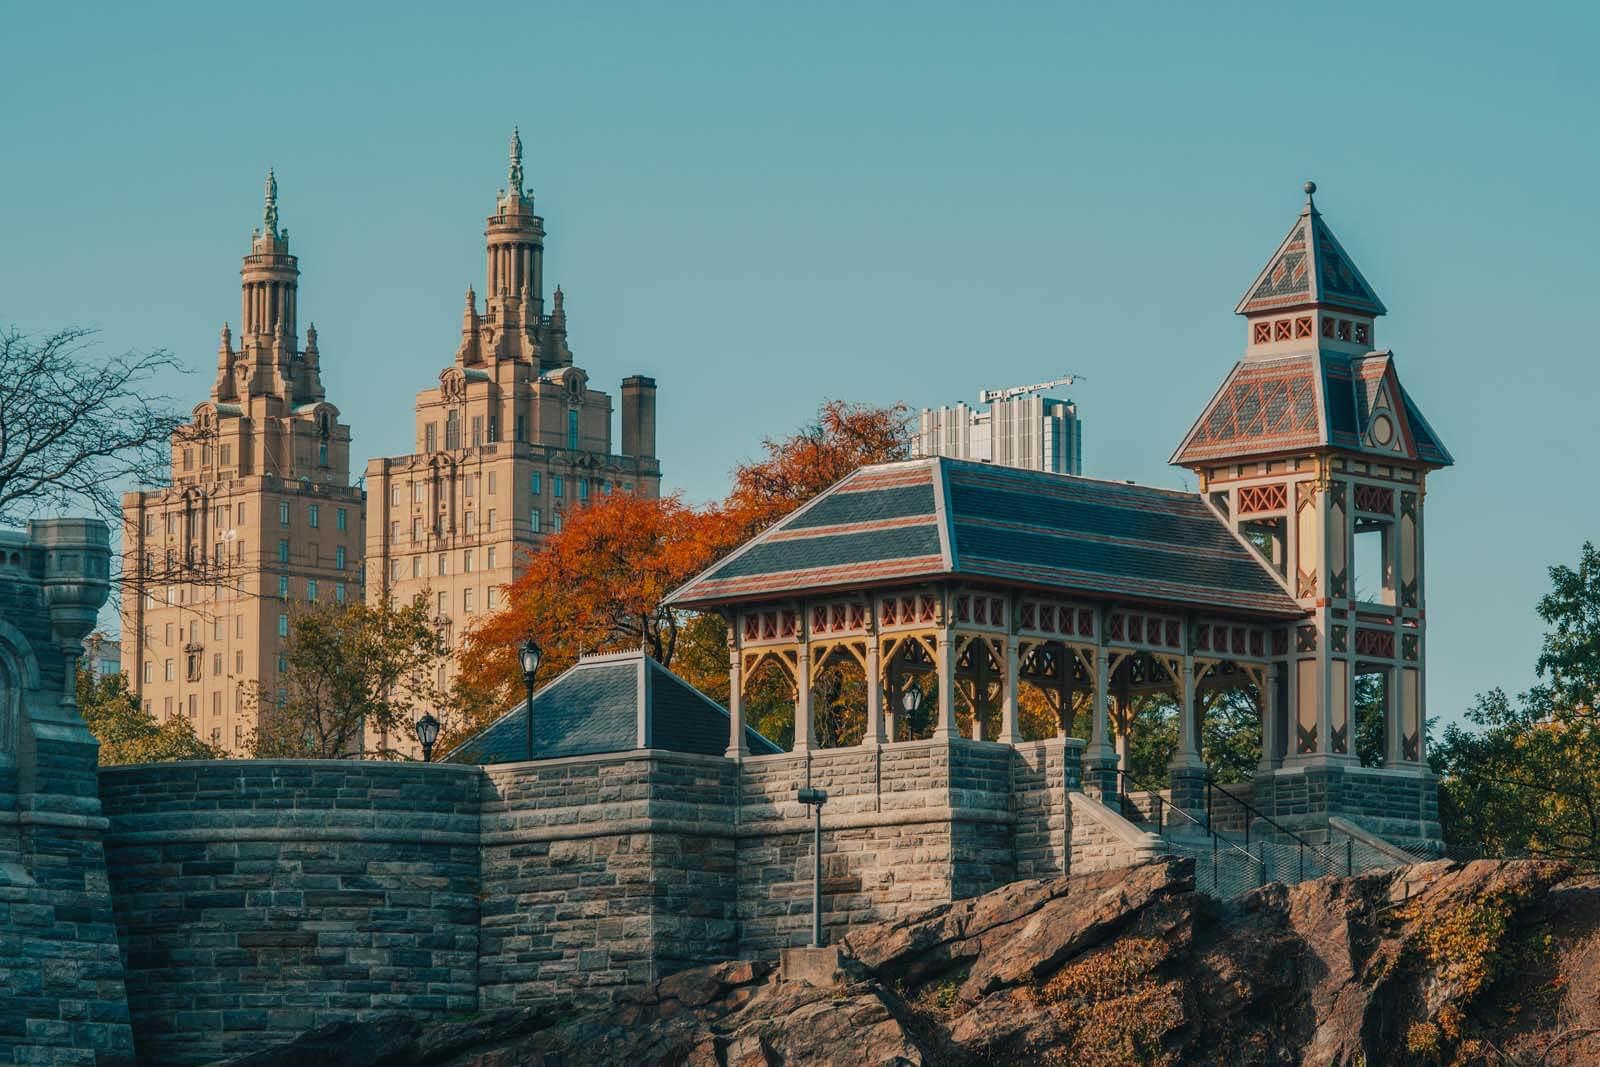 Belvedere Castle in Central Park in Manhattan New York City